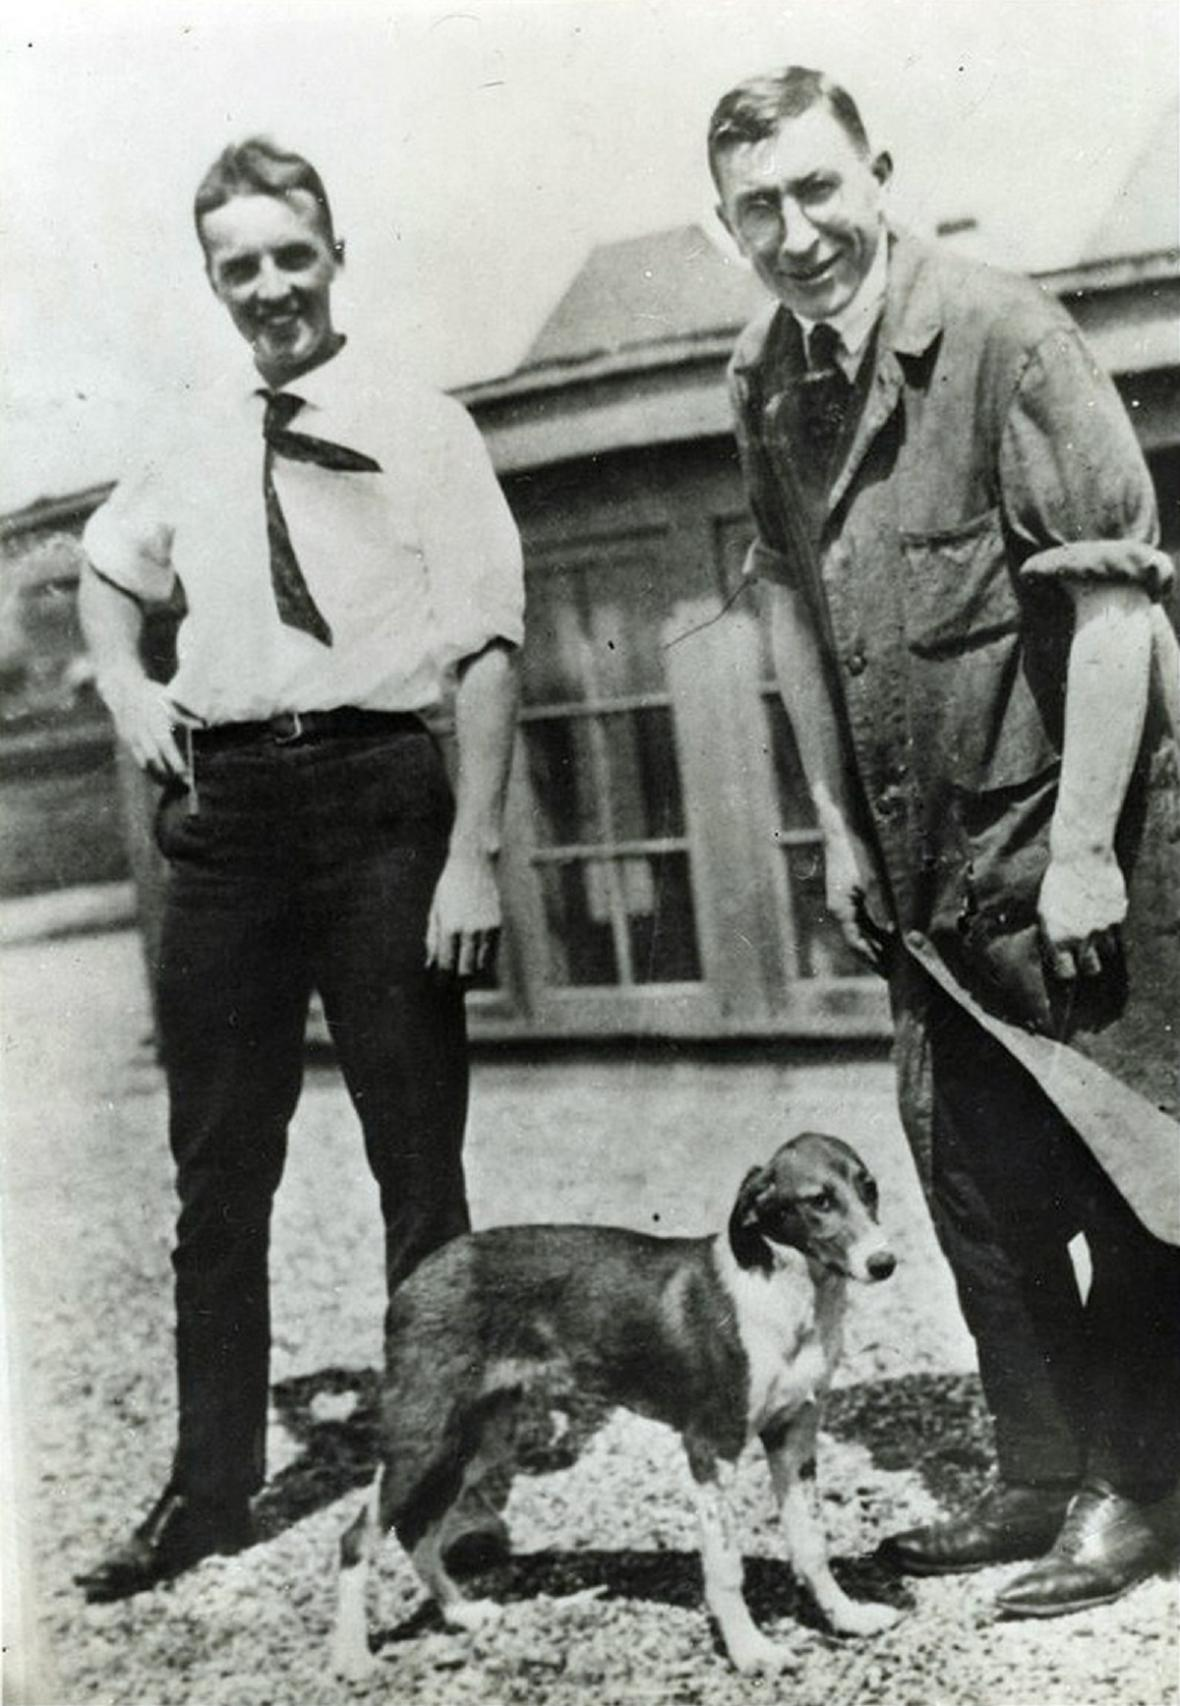 Dr. Charles Best (nalevo) a Sir Frederick Banting (vpravo)